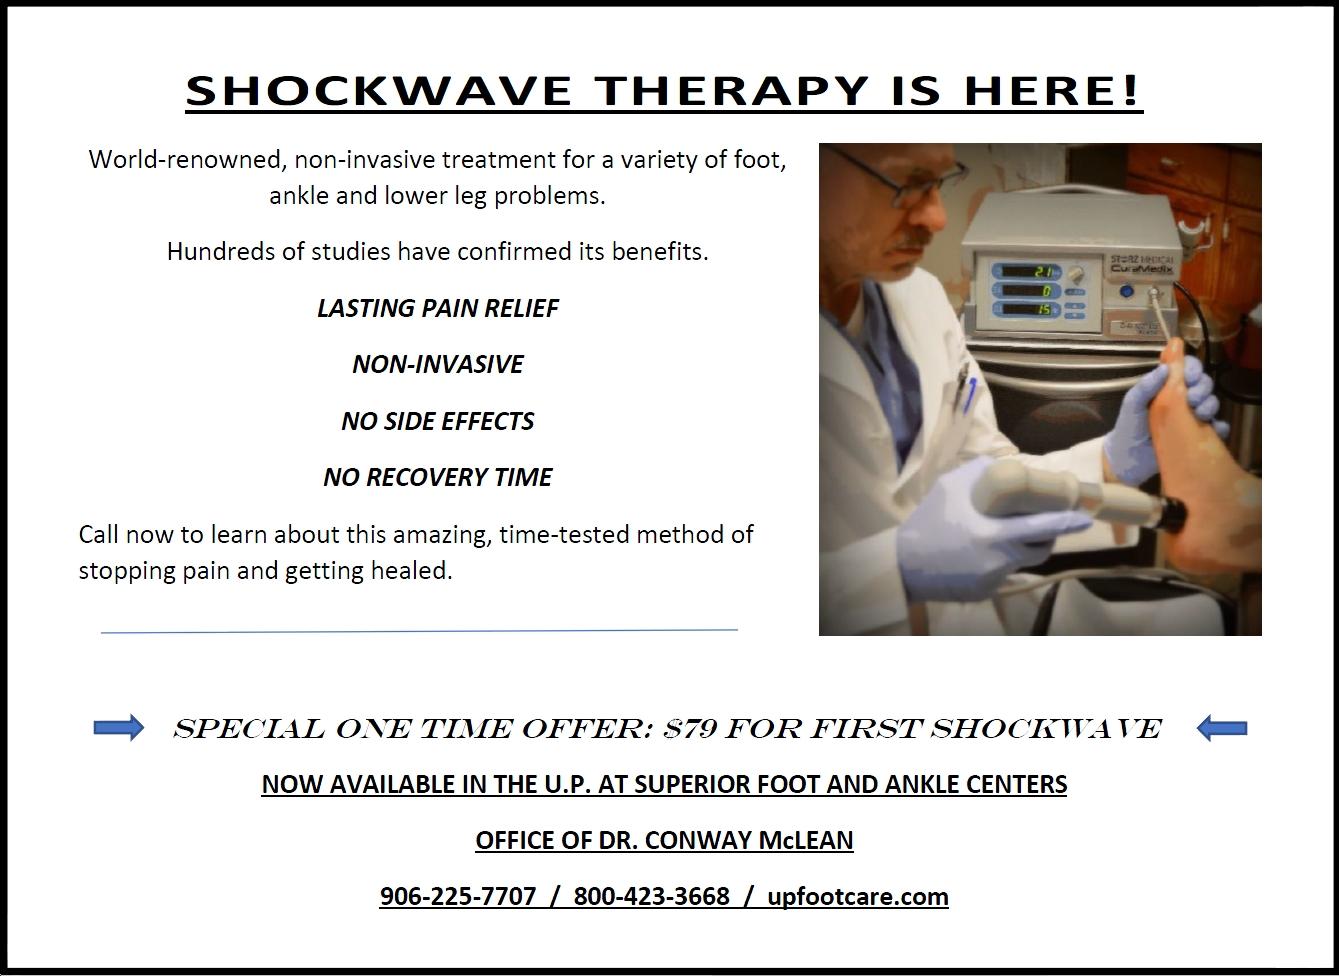 shockwave therapy for pain relief  - podiatrist in marquette, escanaba, upper peninsula, michigan